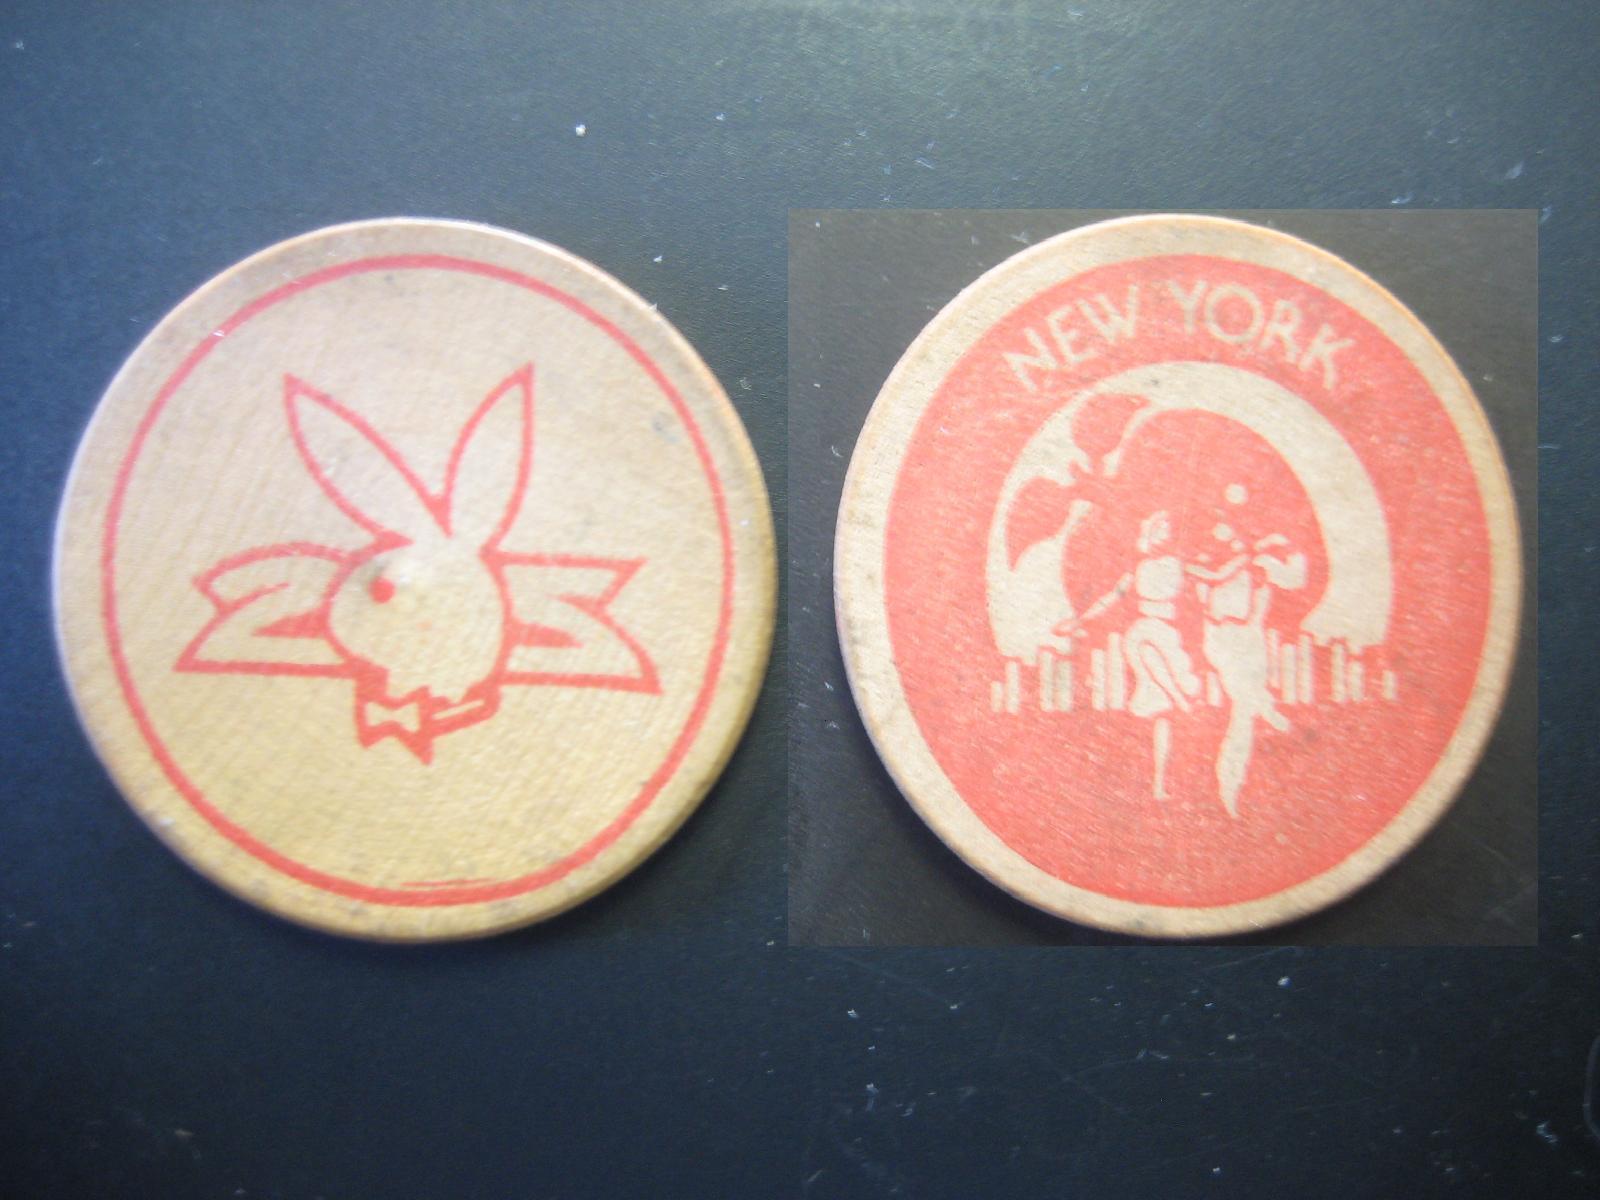 Playboy Club New York Wooden Nickel